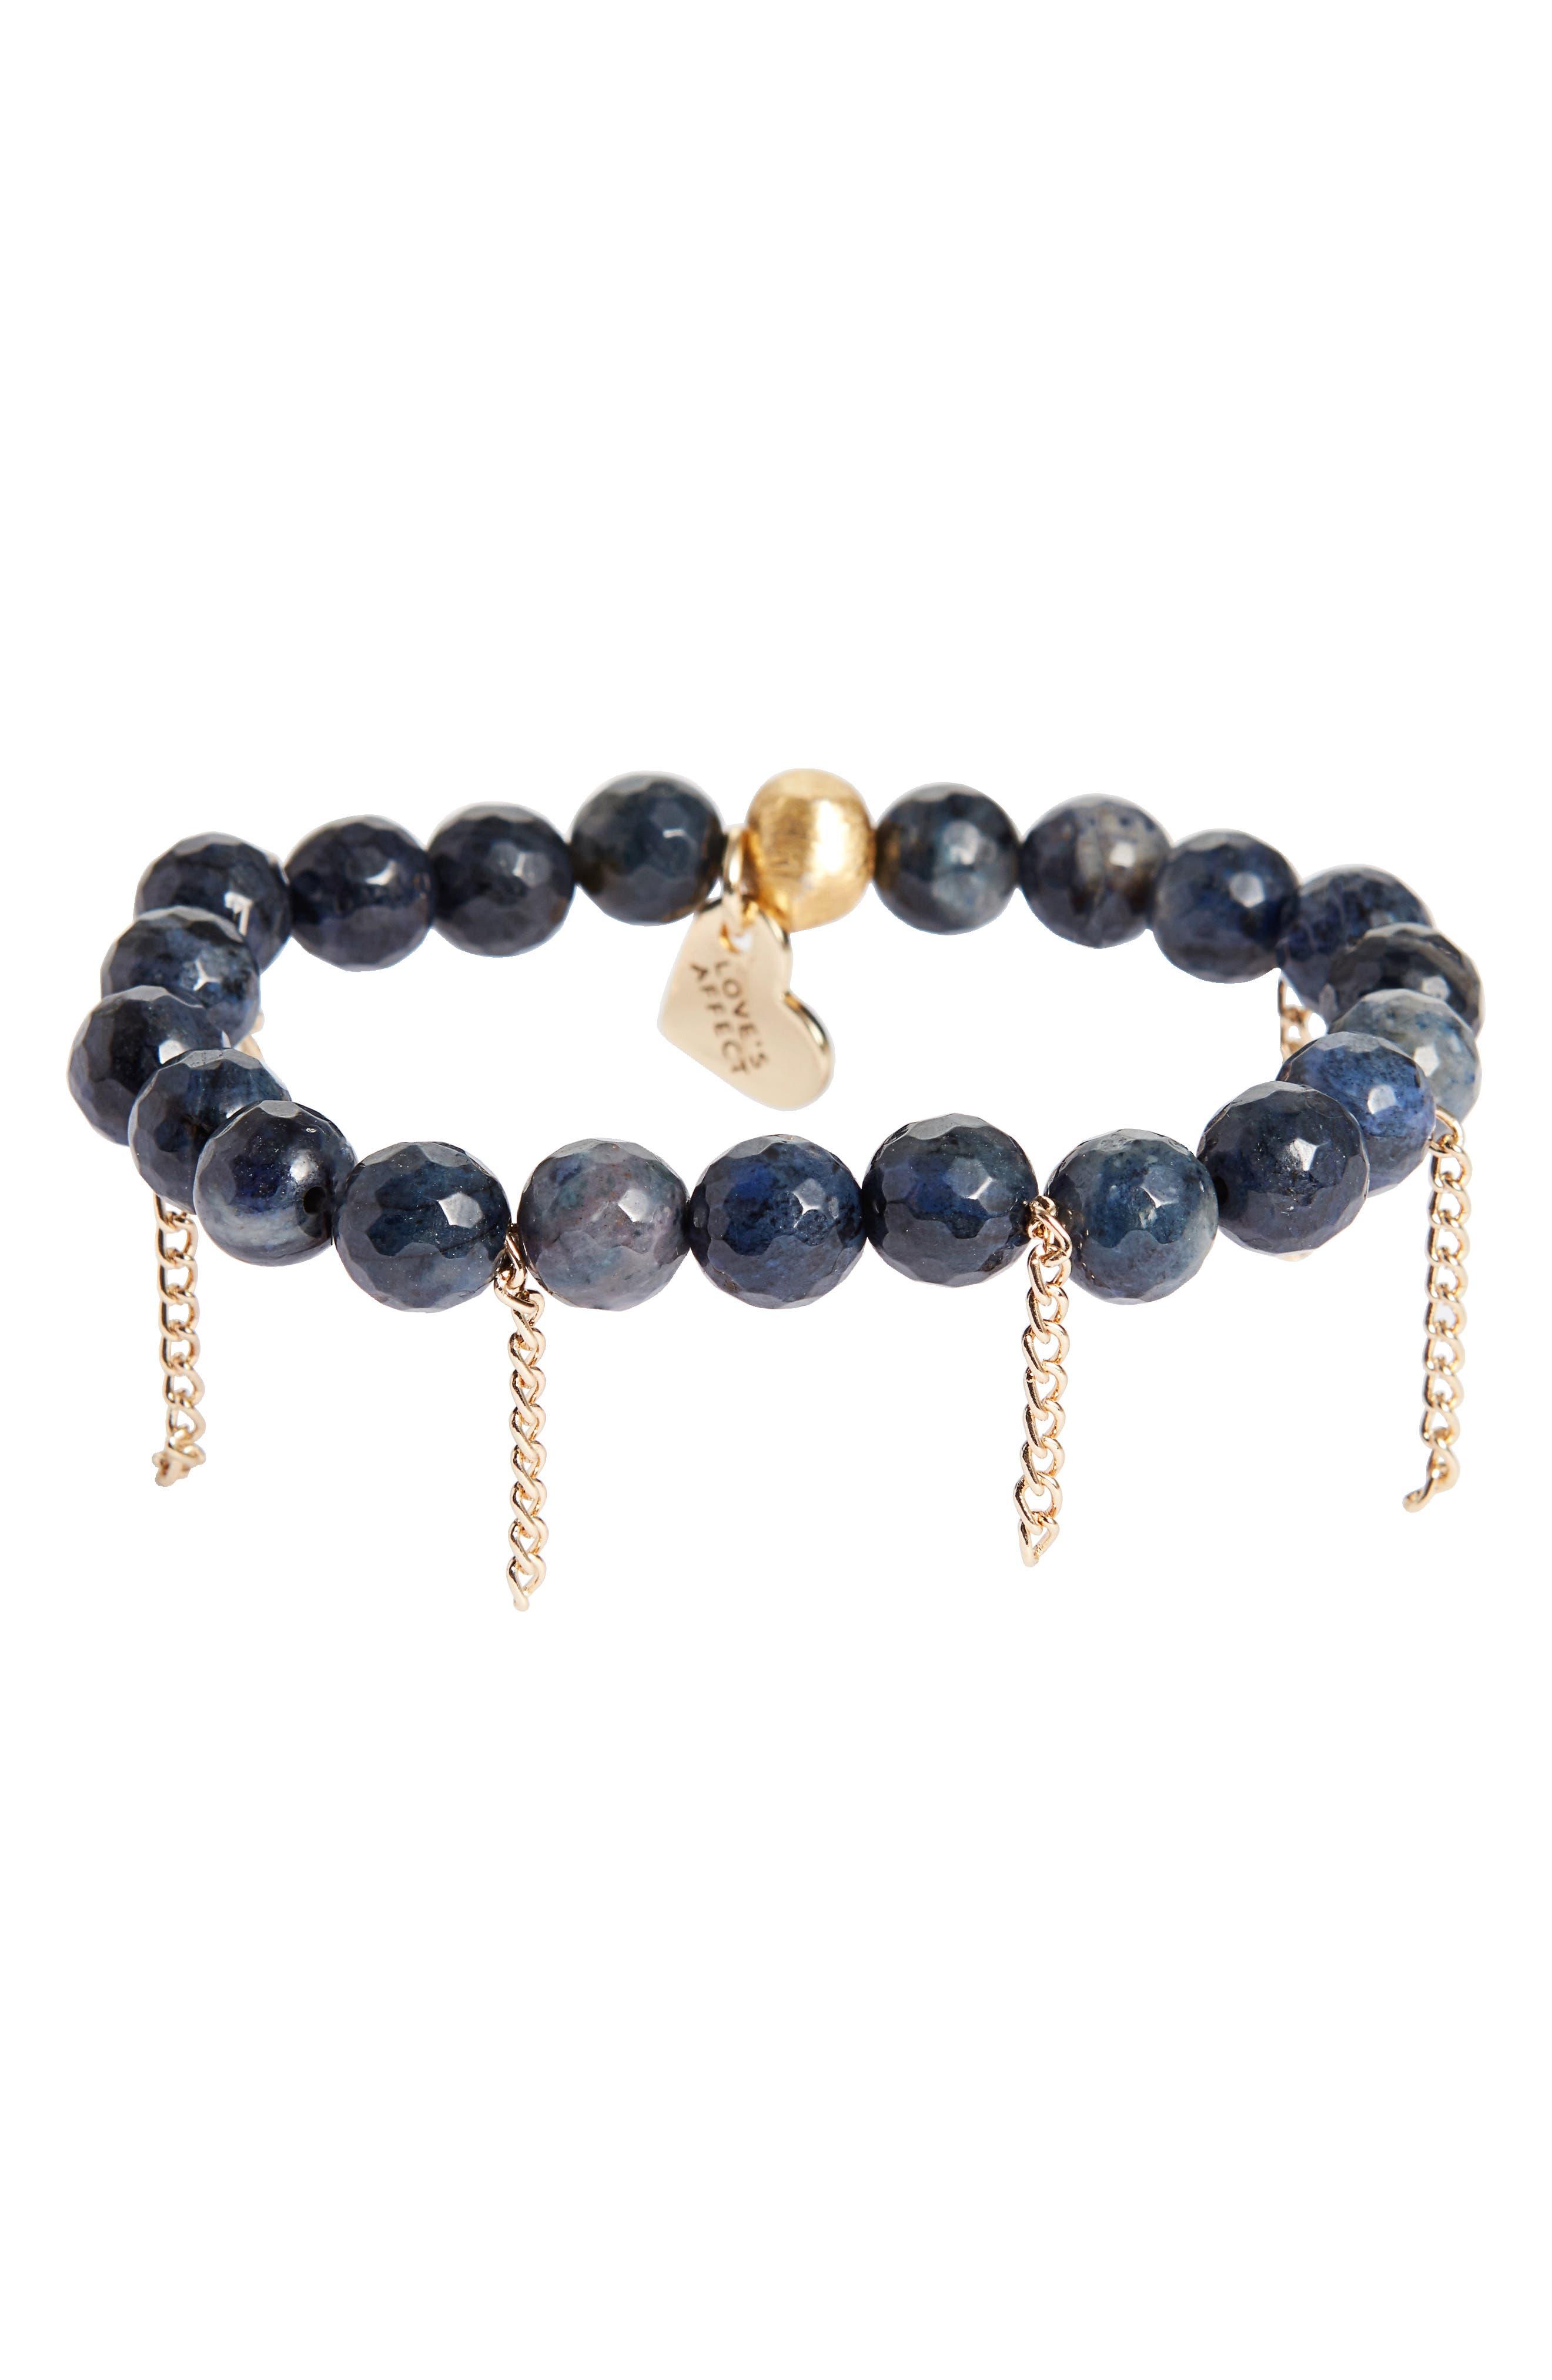 Alternate Image 1 Selected - Love's Affect Devyn Semiprecious Stretch Bracelet